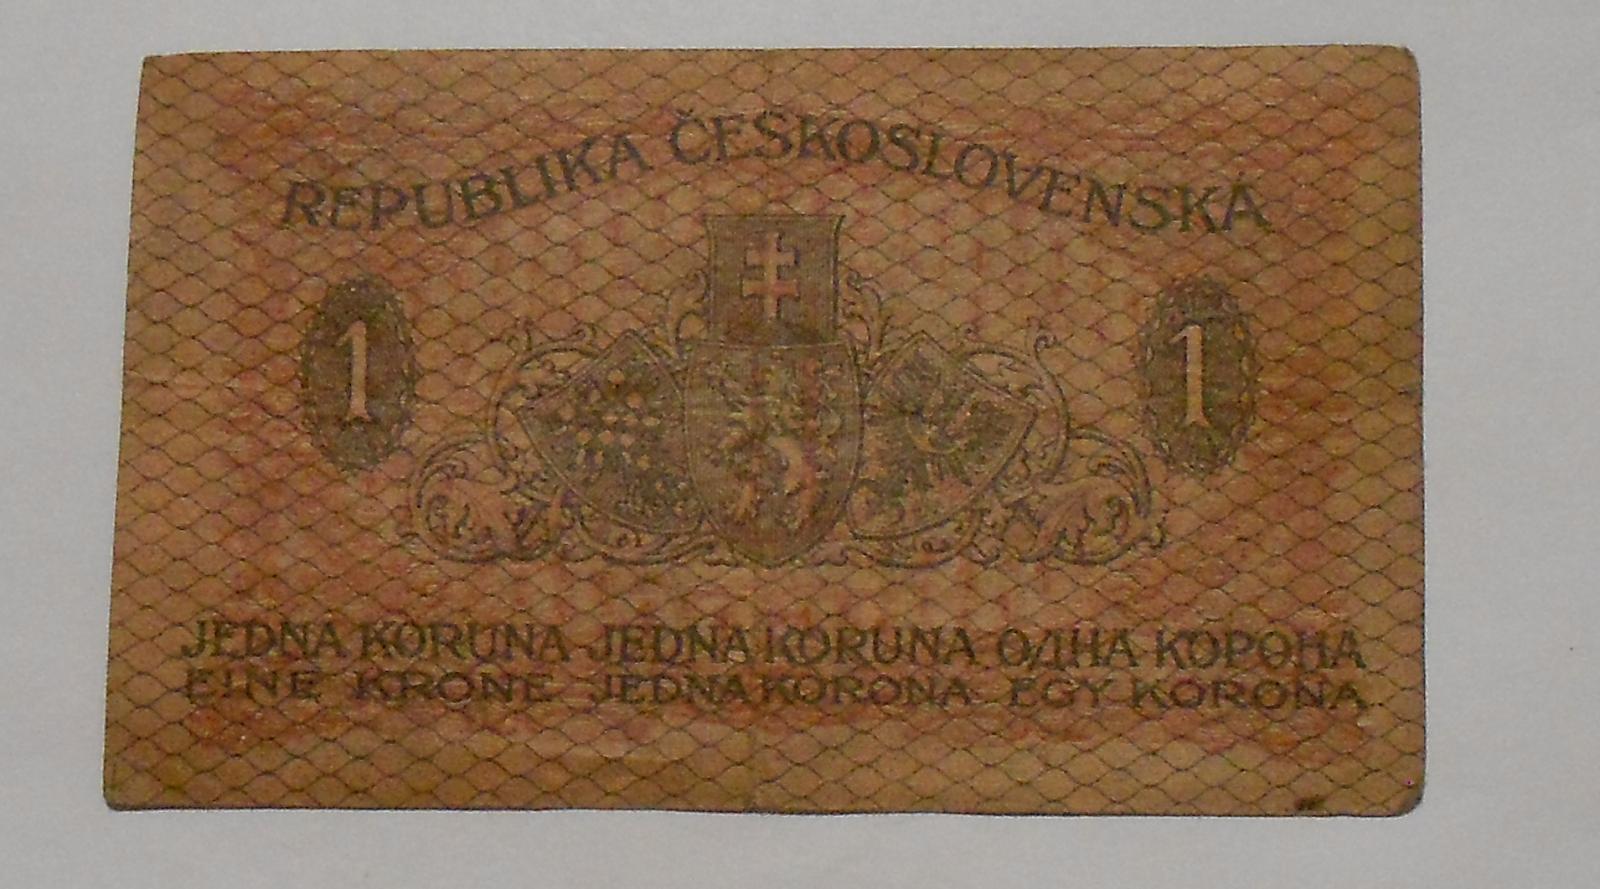 ČSR 1 Koruna 1919 s-255